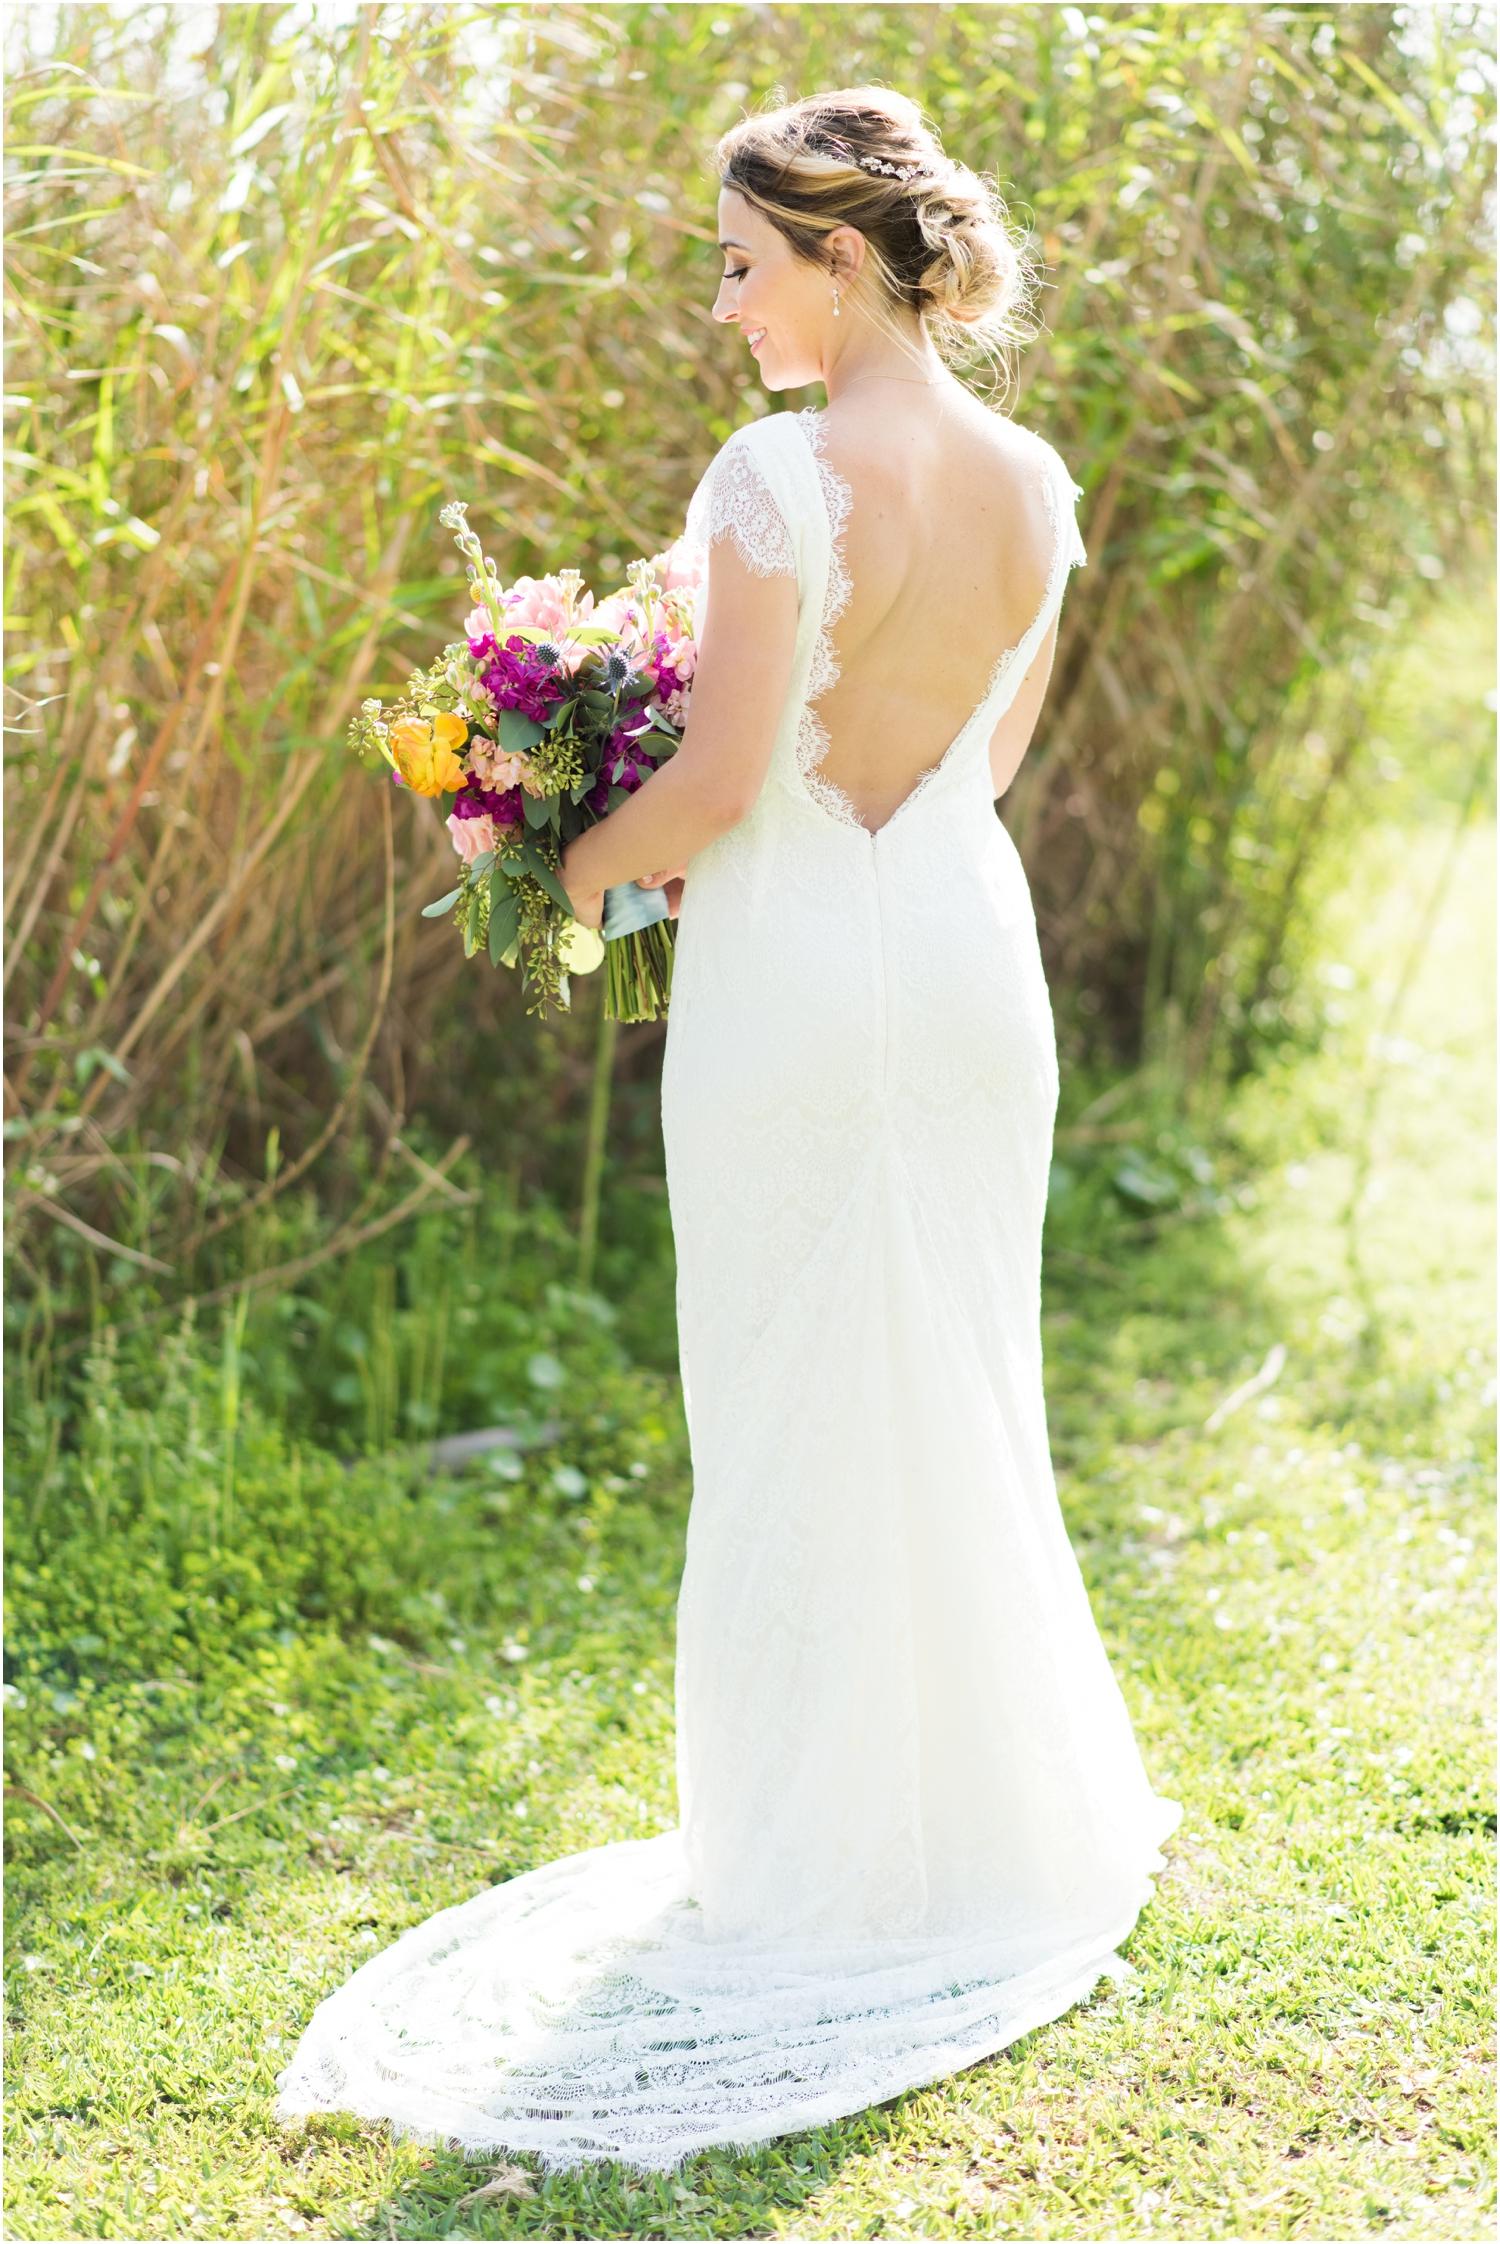 Gulf Shores Orange Beach Alabama Family Home on the Water Wedding Photographer bride groom